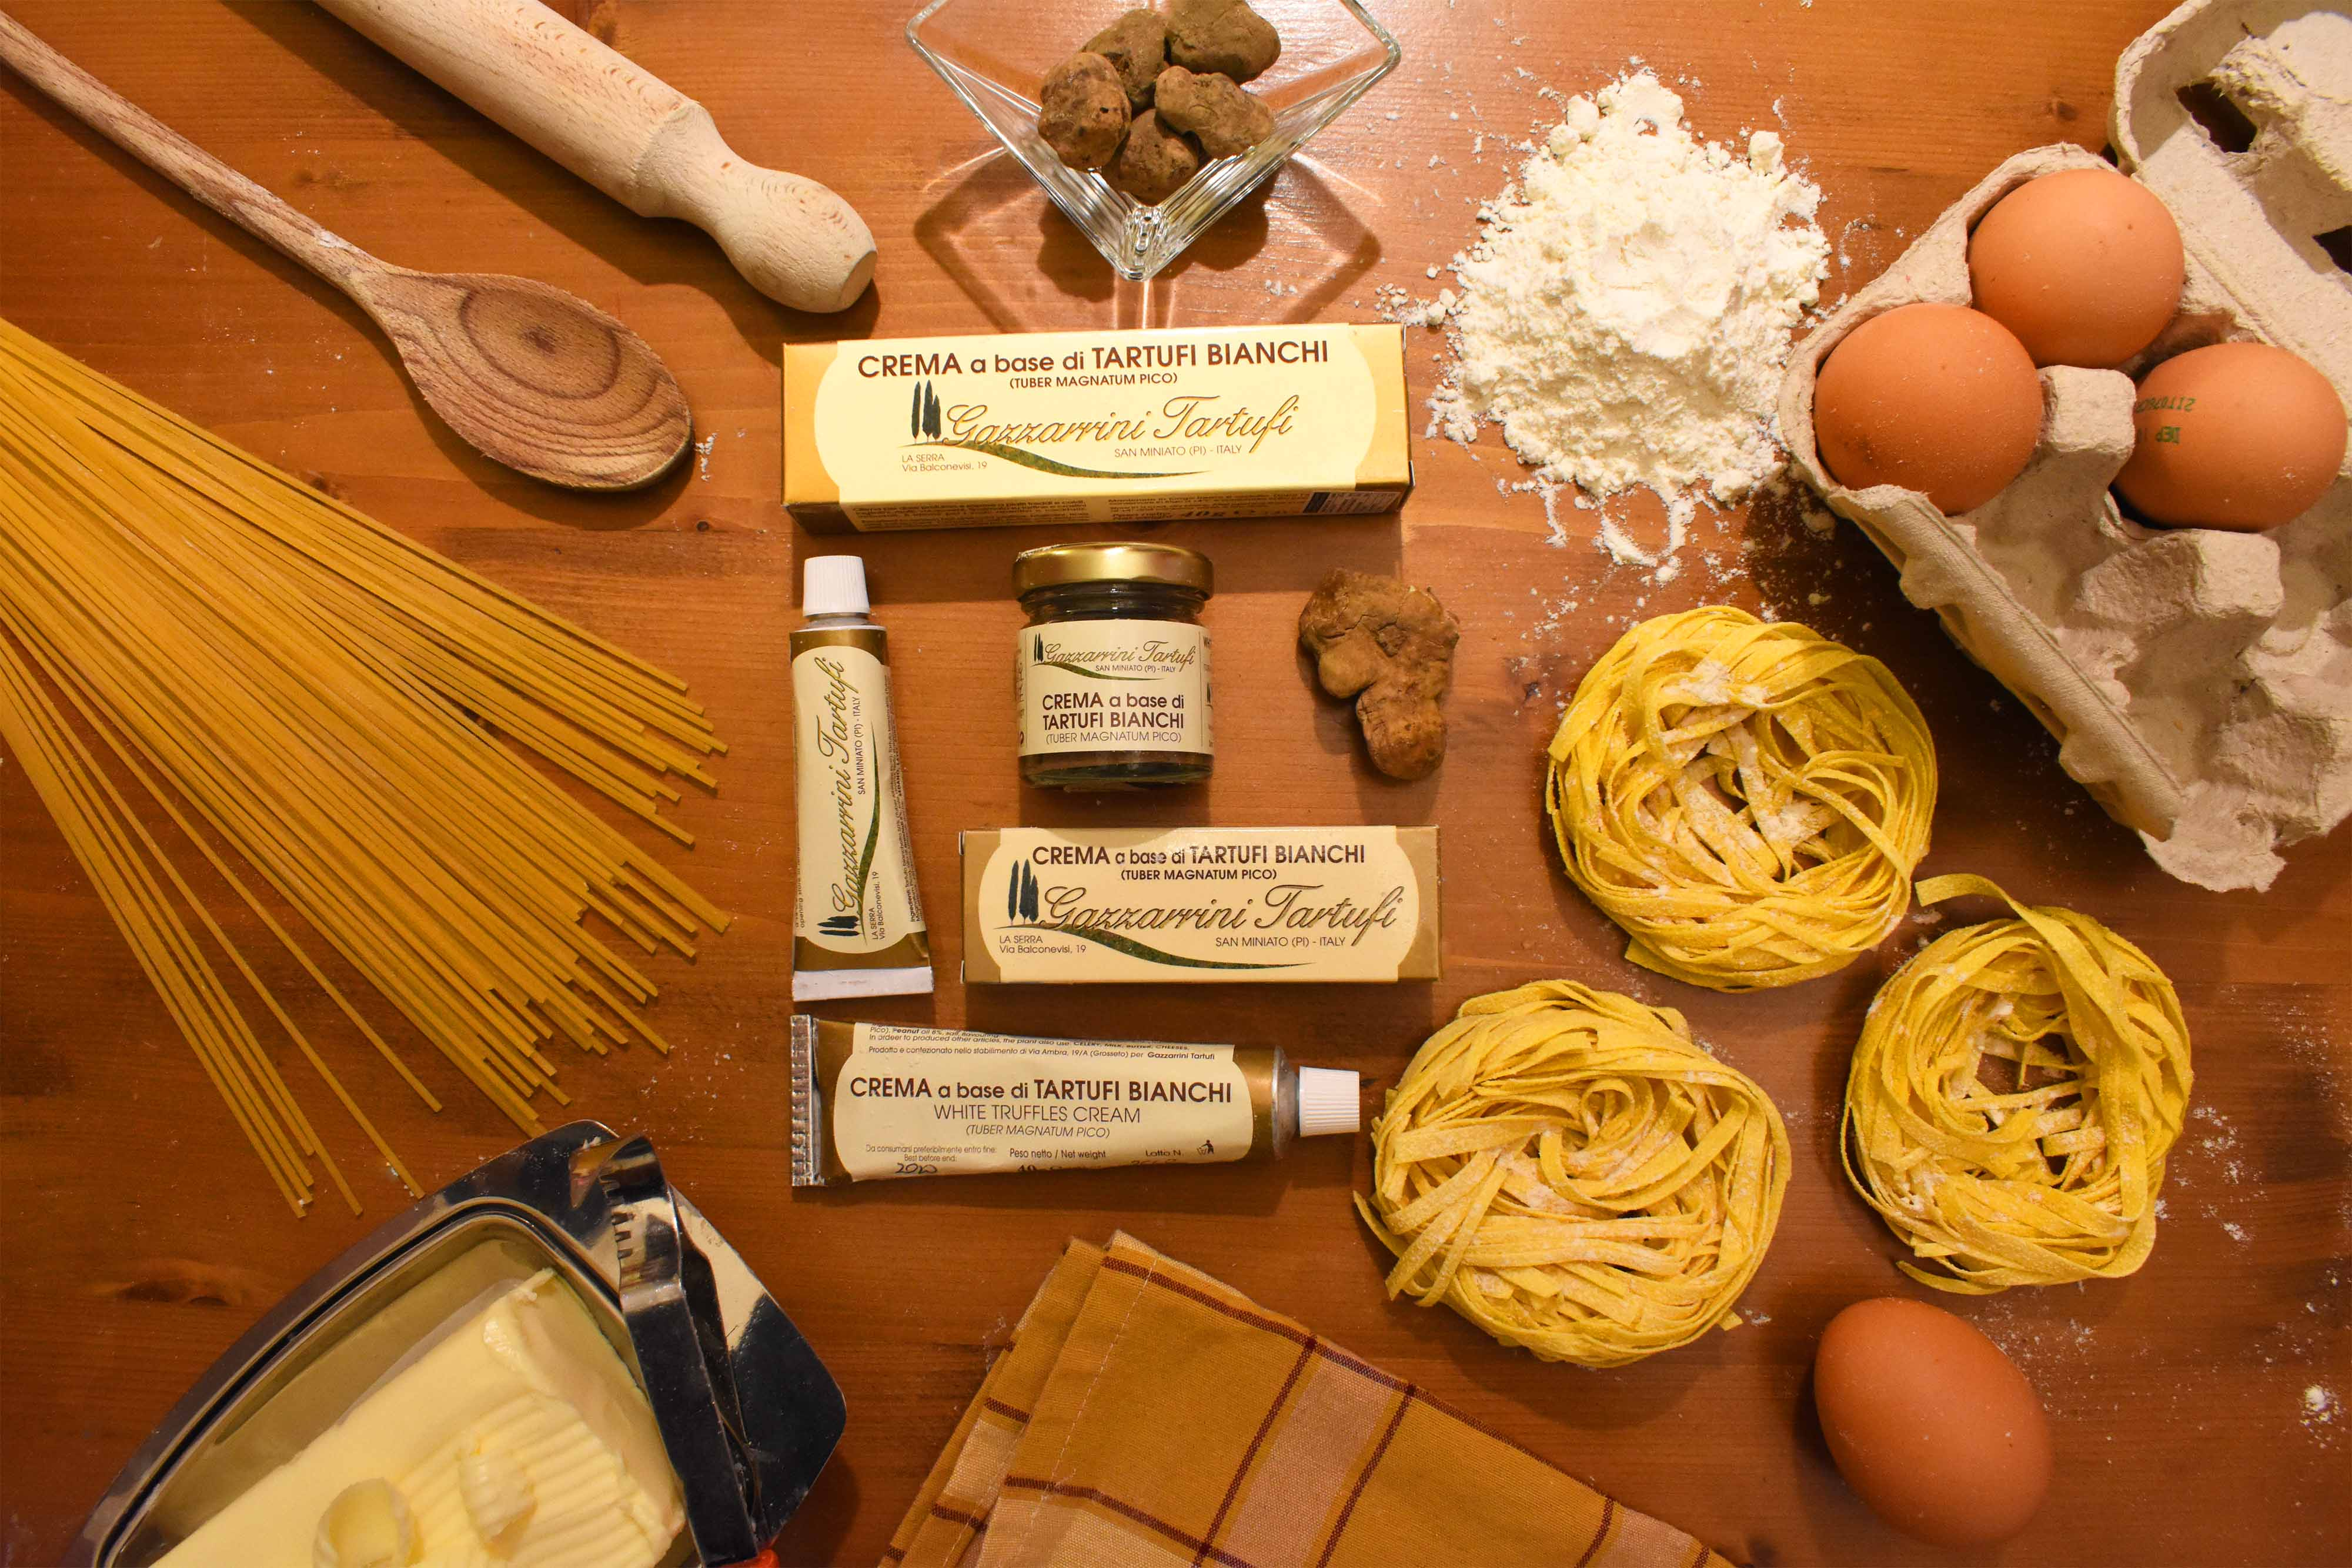 crema tartufi bianchi, tartufi di san miniato, gazzarrini